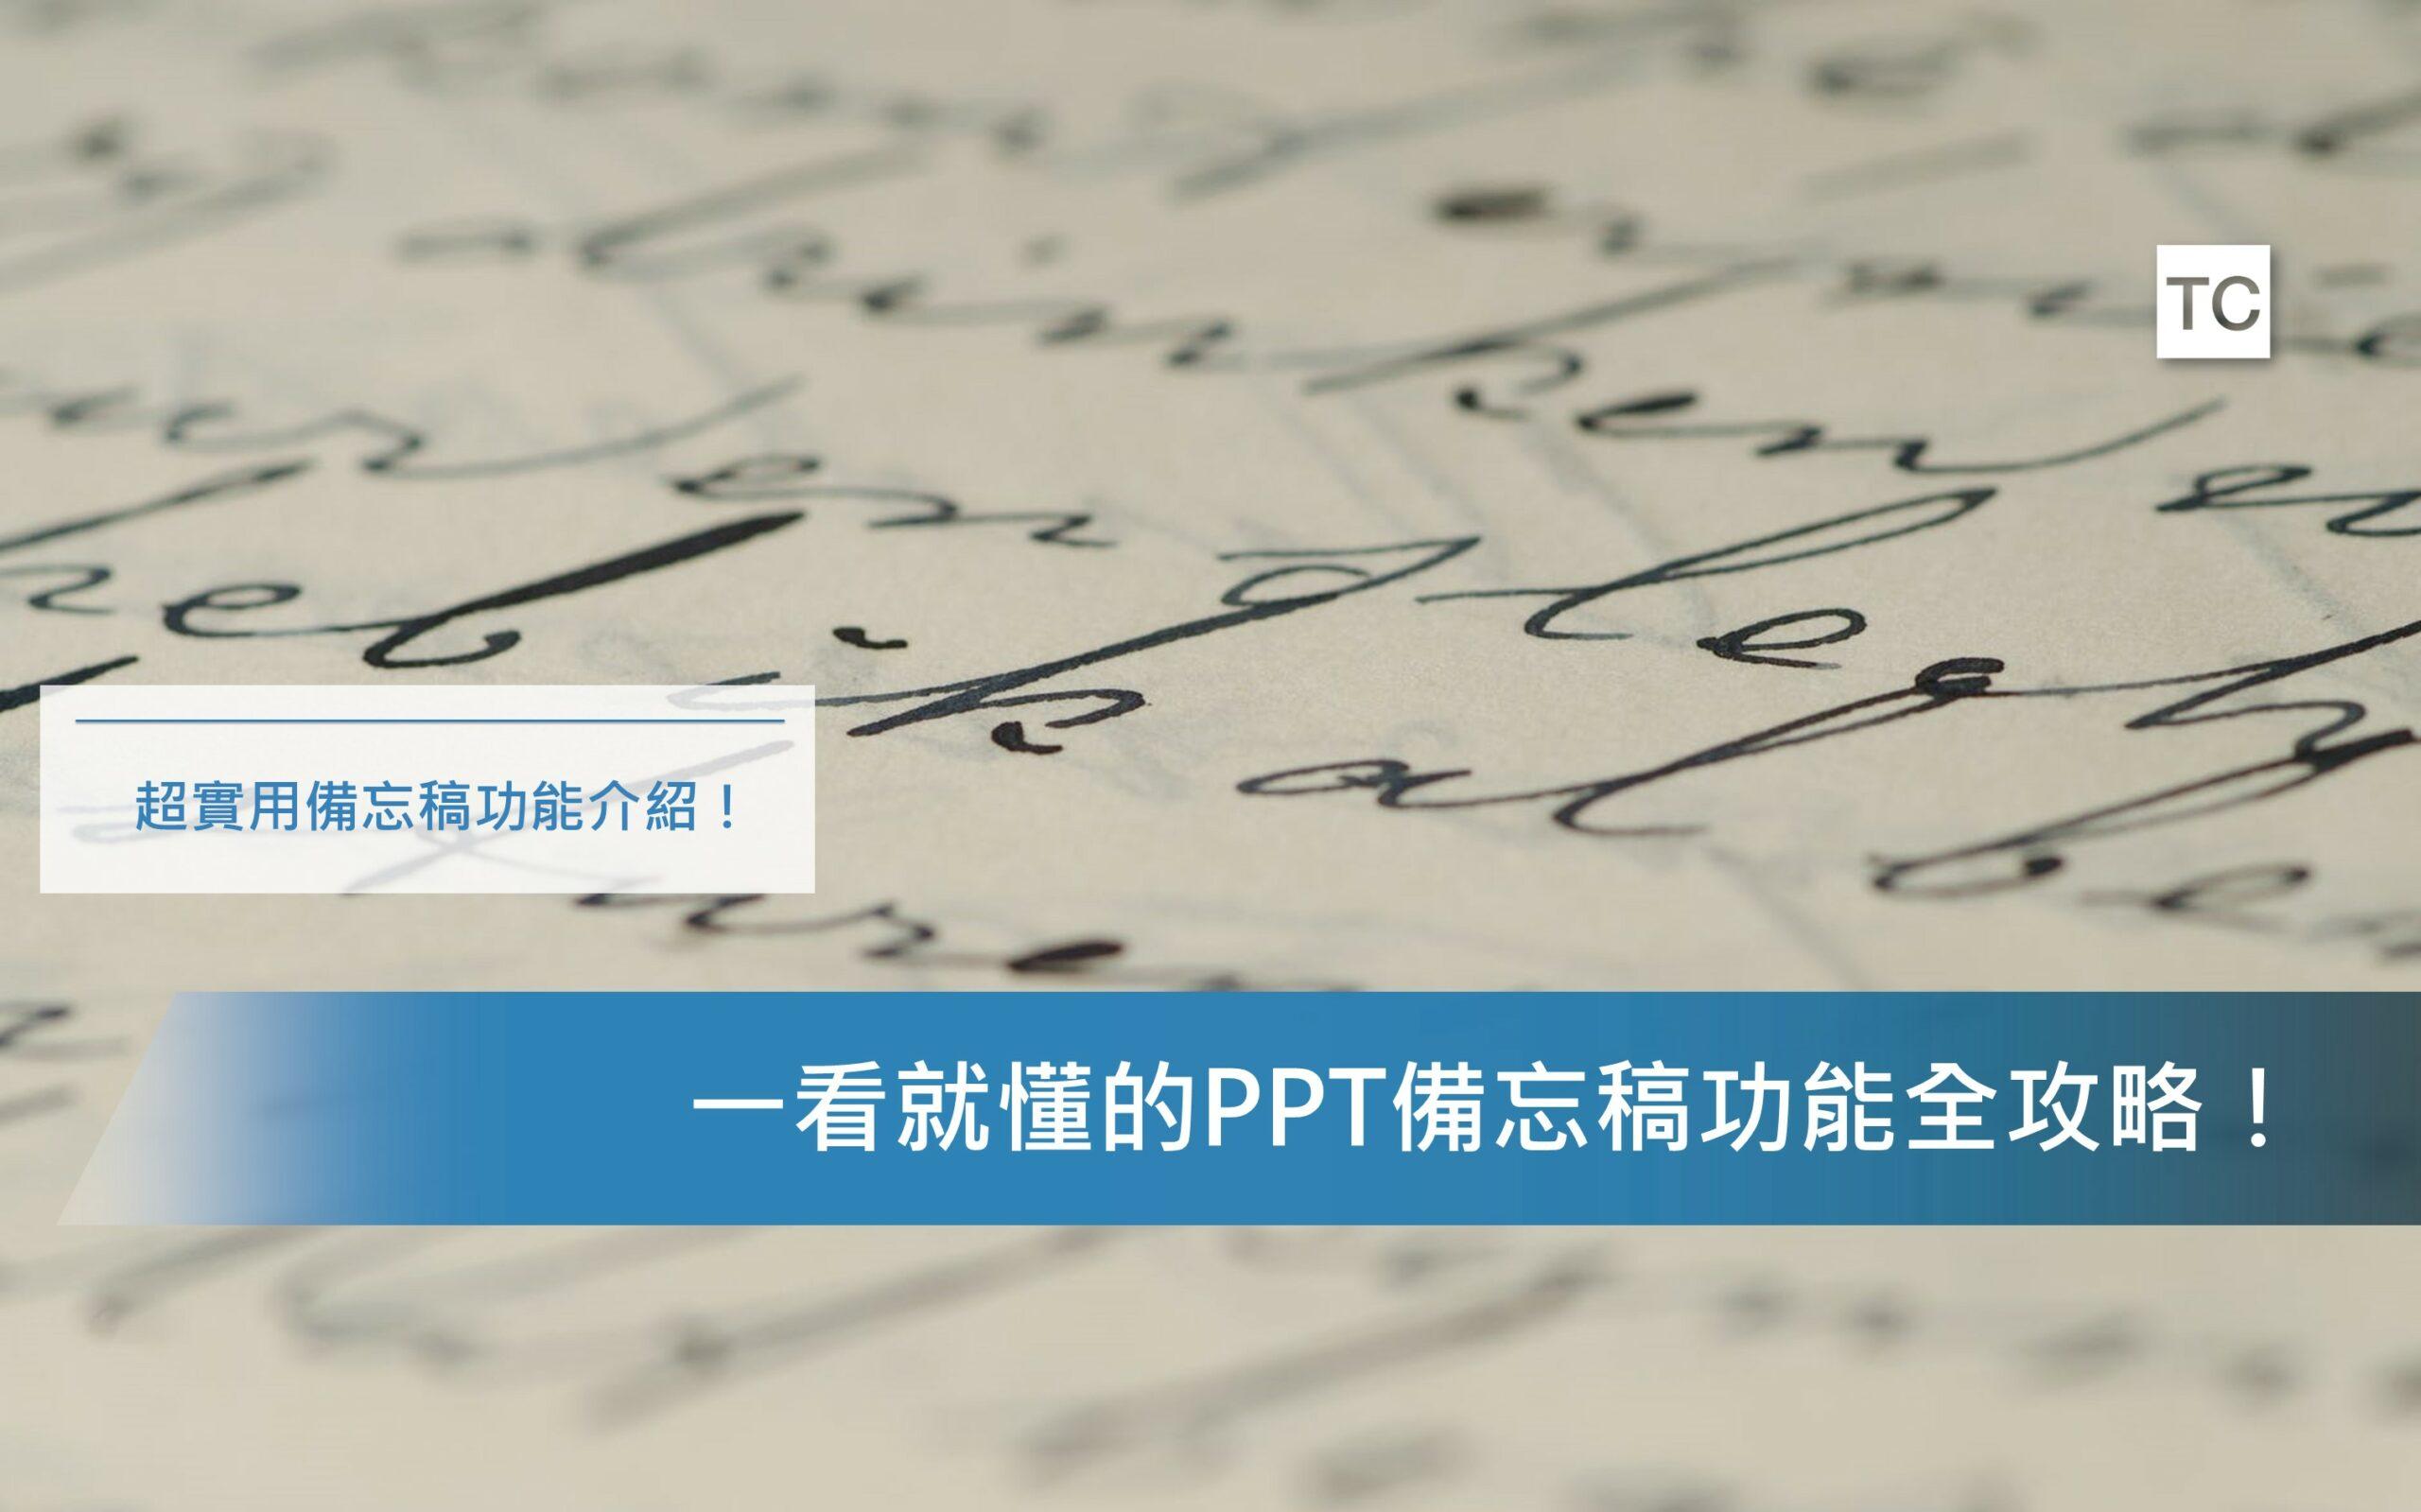 PPT教學|你知道PPT備忘稿列印的方法嗎?幾個步驟簡單教你!